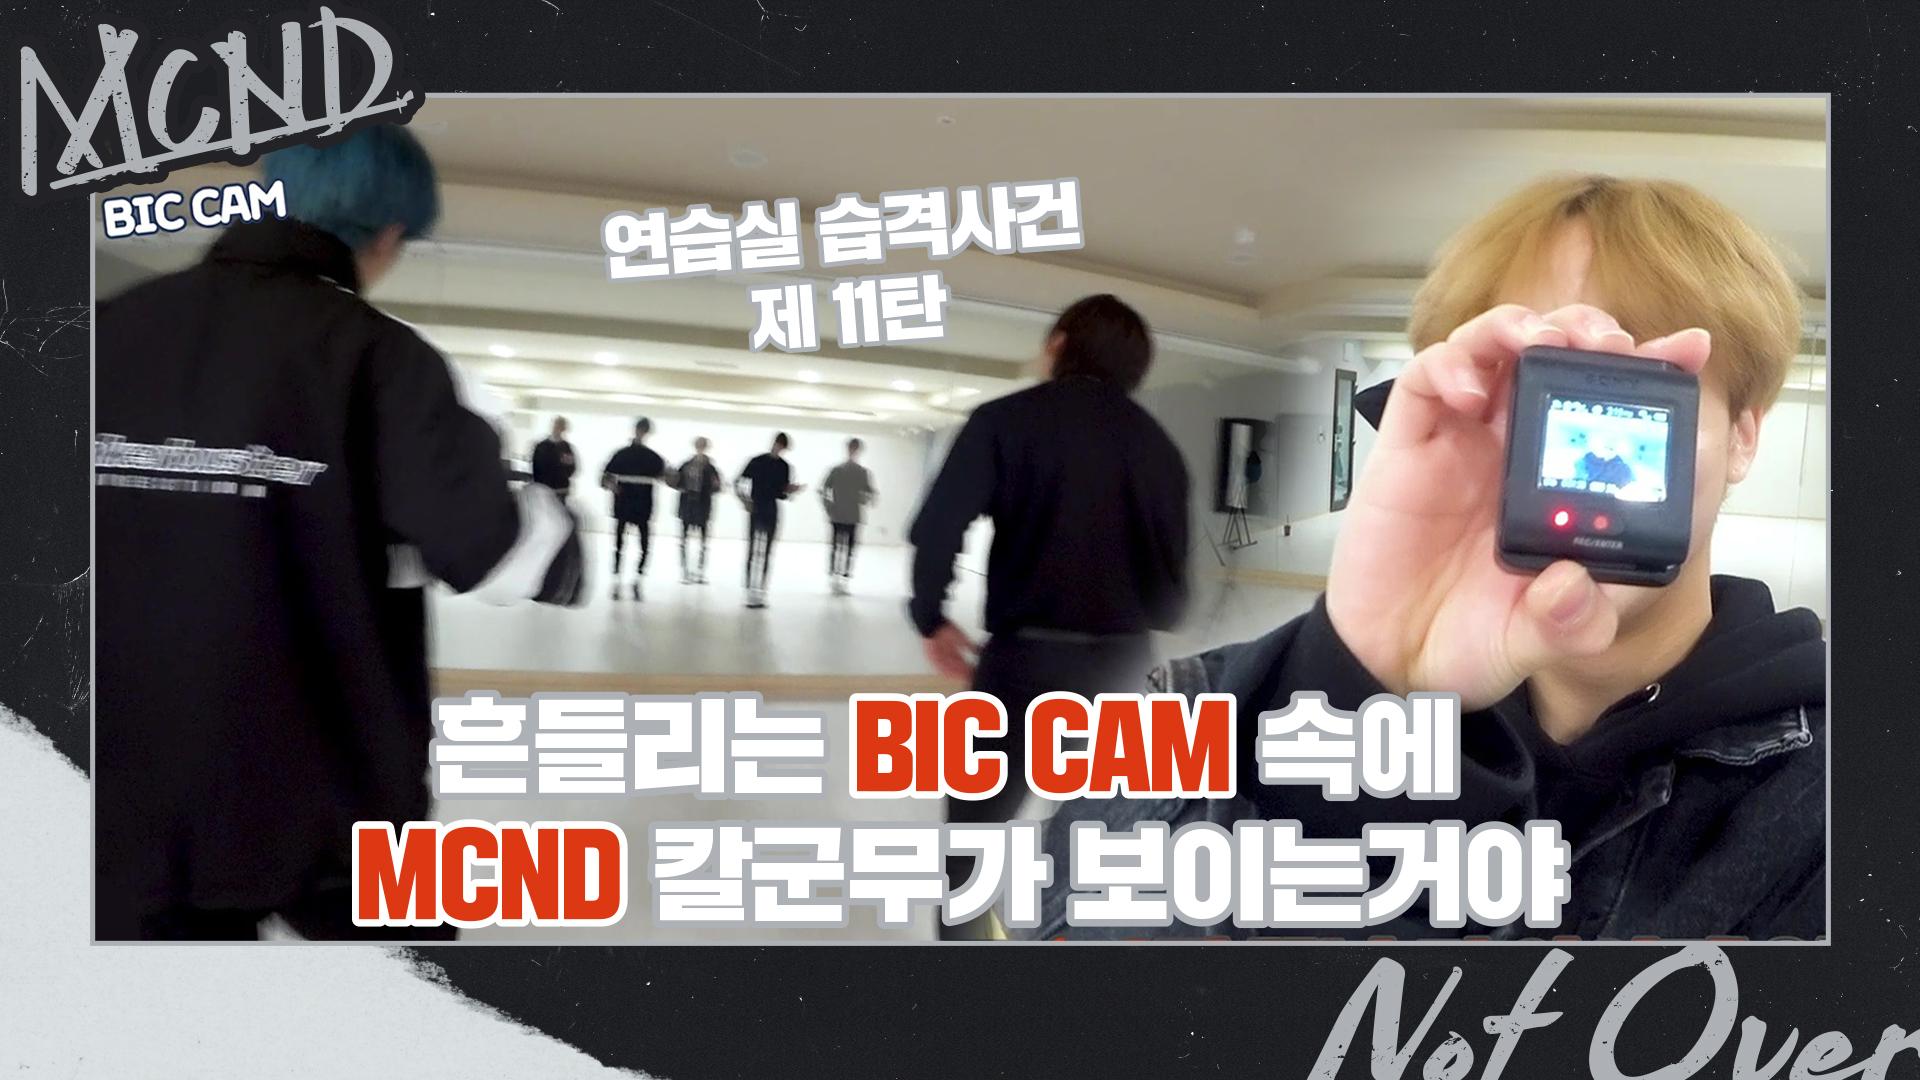 [Let's Play MCND] M-HINDㅣ흔들리는 BIC CAM 속에 MCND 칼군무가 보이는거야 ㅣ연습실 습격사건 제 11탄!